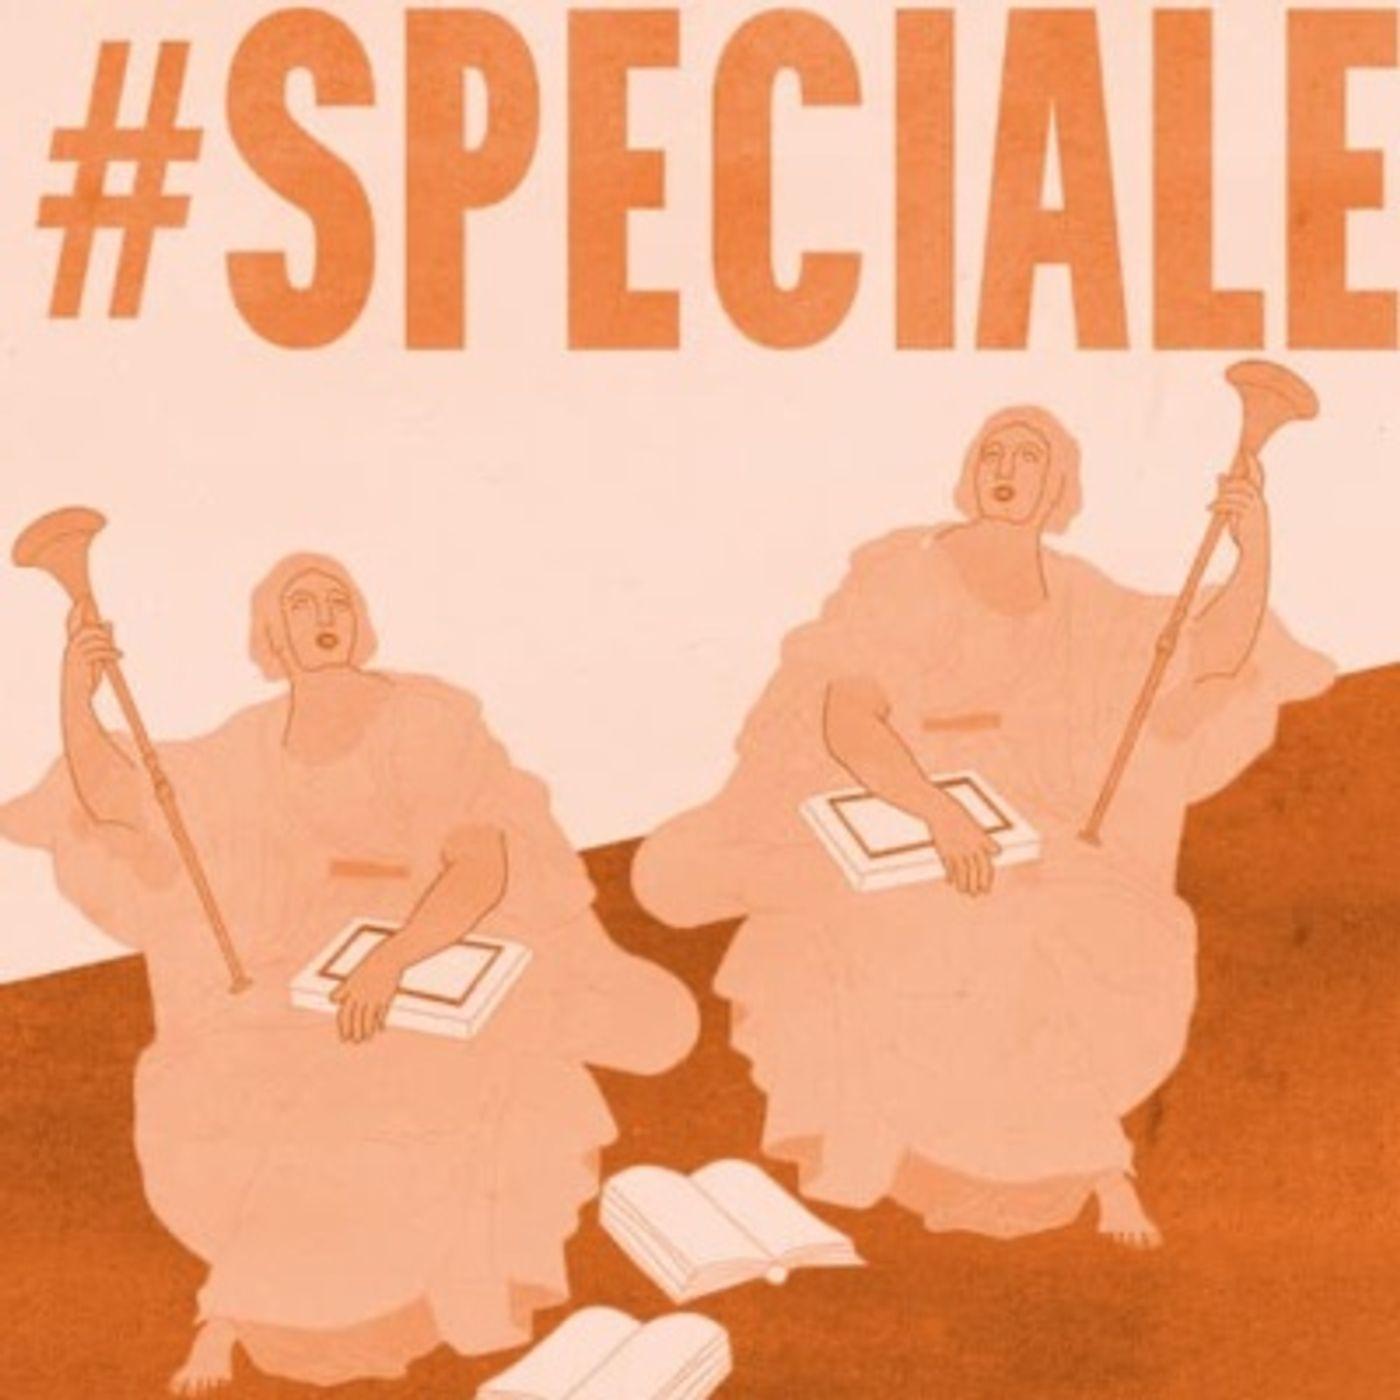 #Speciale Ferrante: intervista a Isabella Pinto